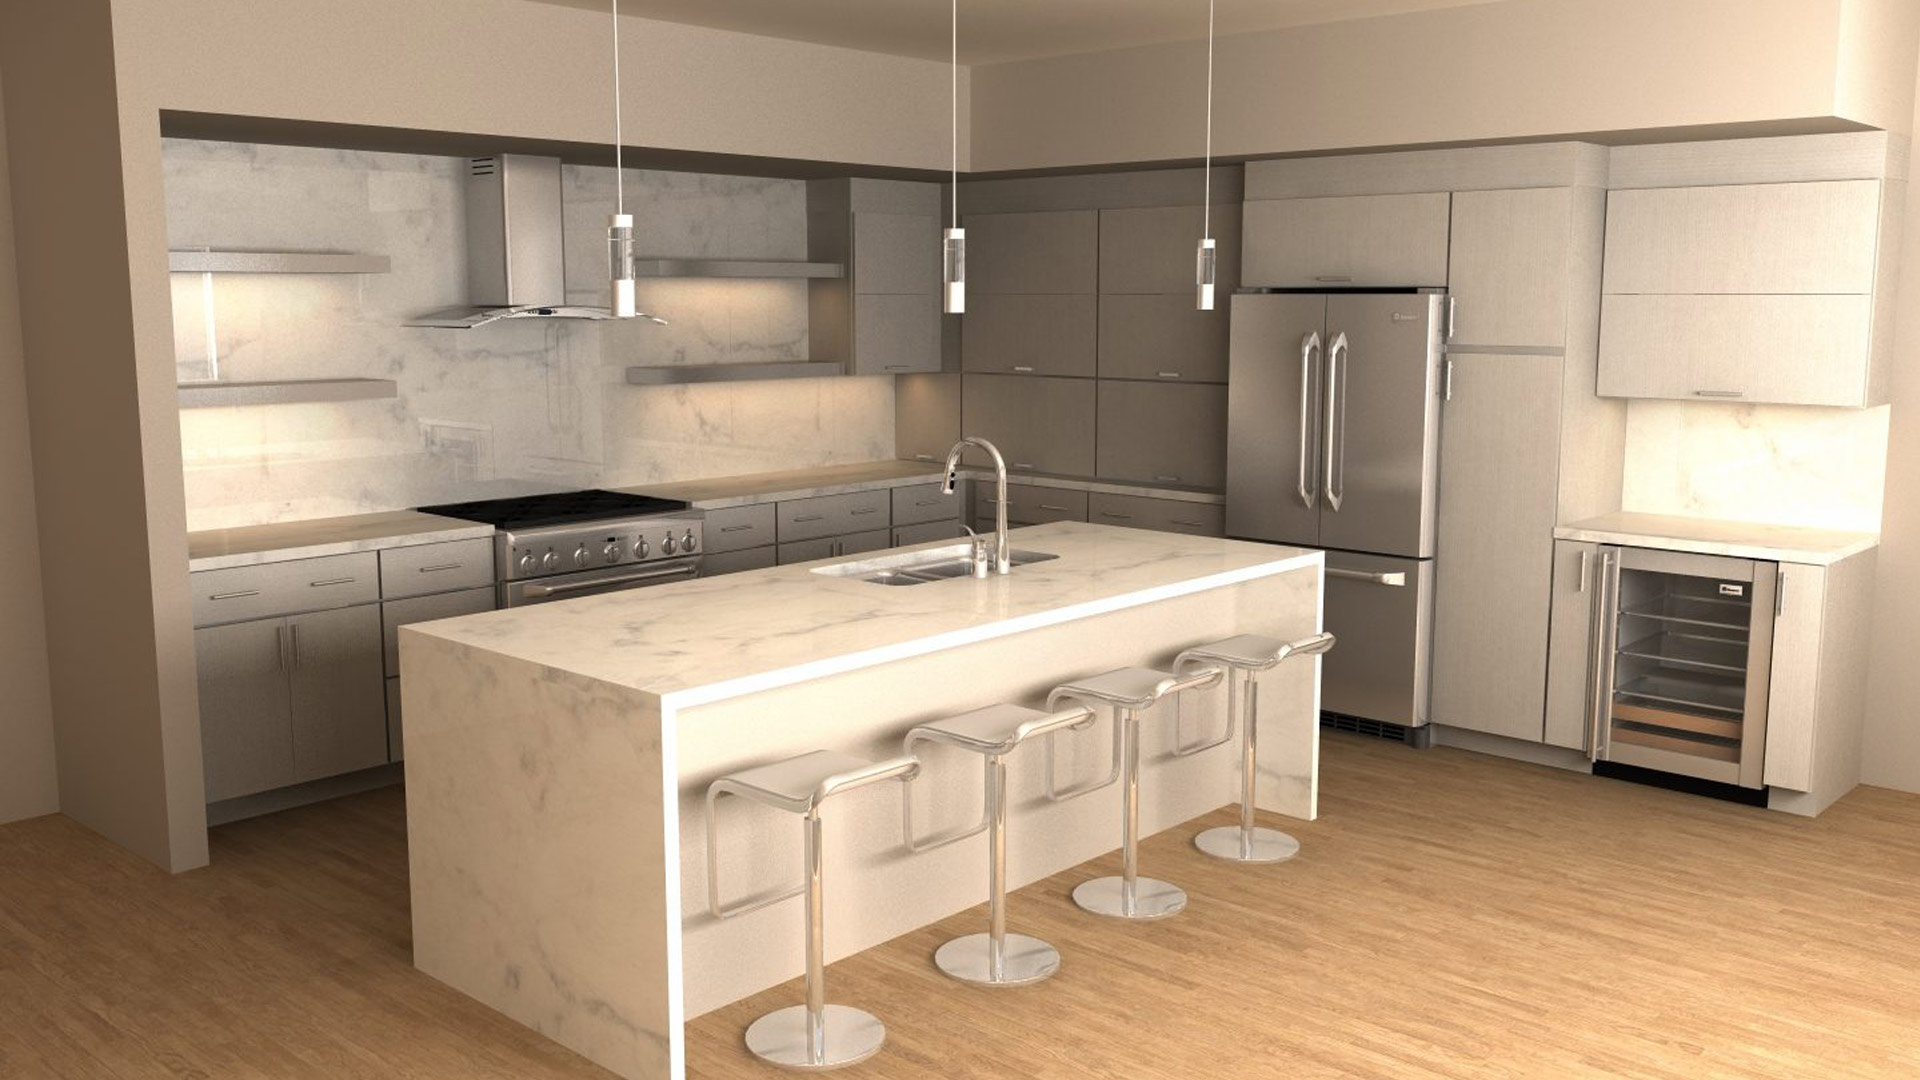 10 Top Trends for Kitchen Design in 2020 | Around The Home on Kitchen Modern Design 2020  id=27886